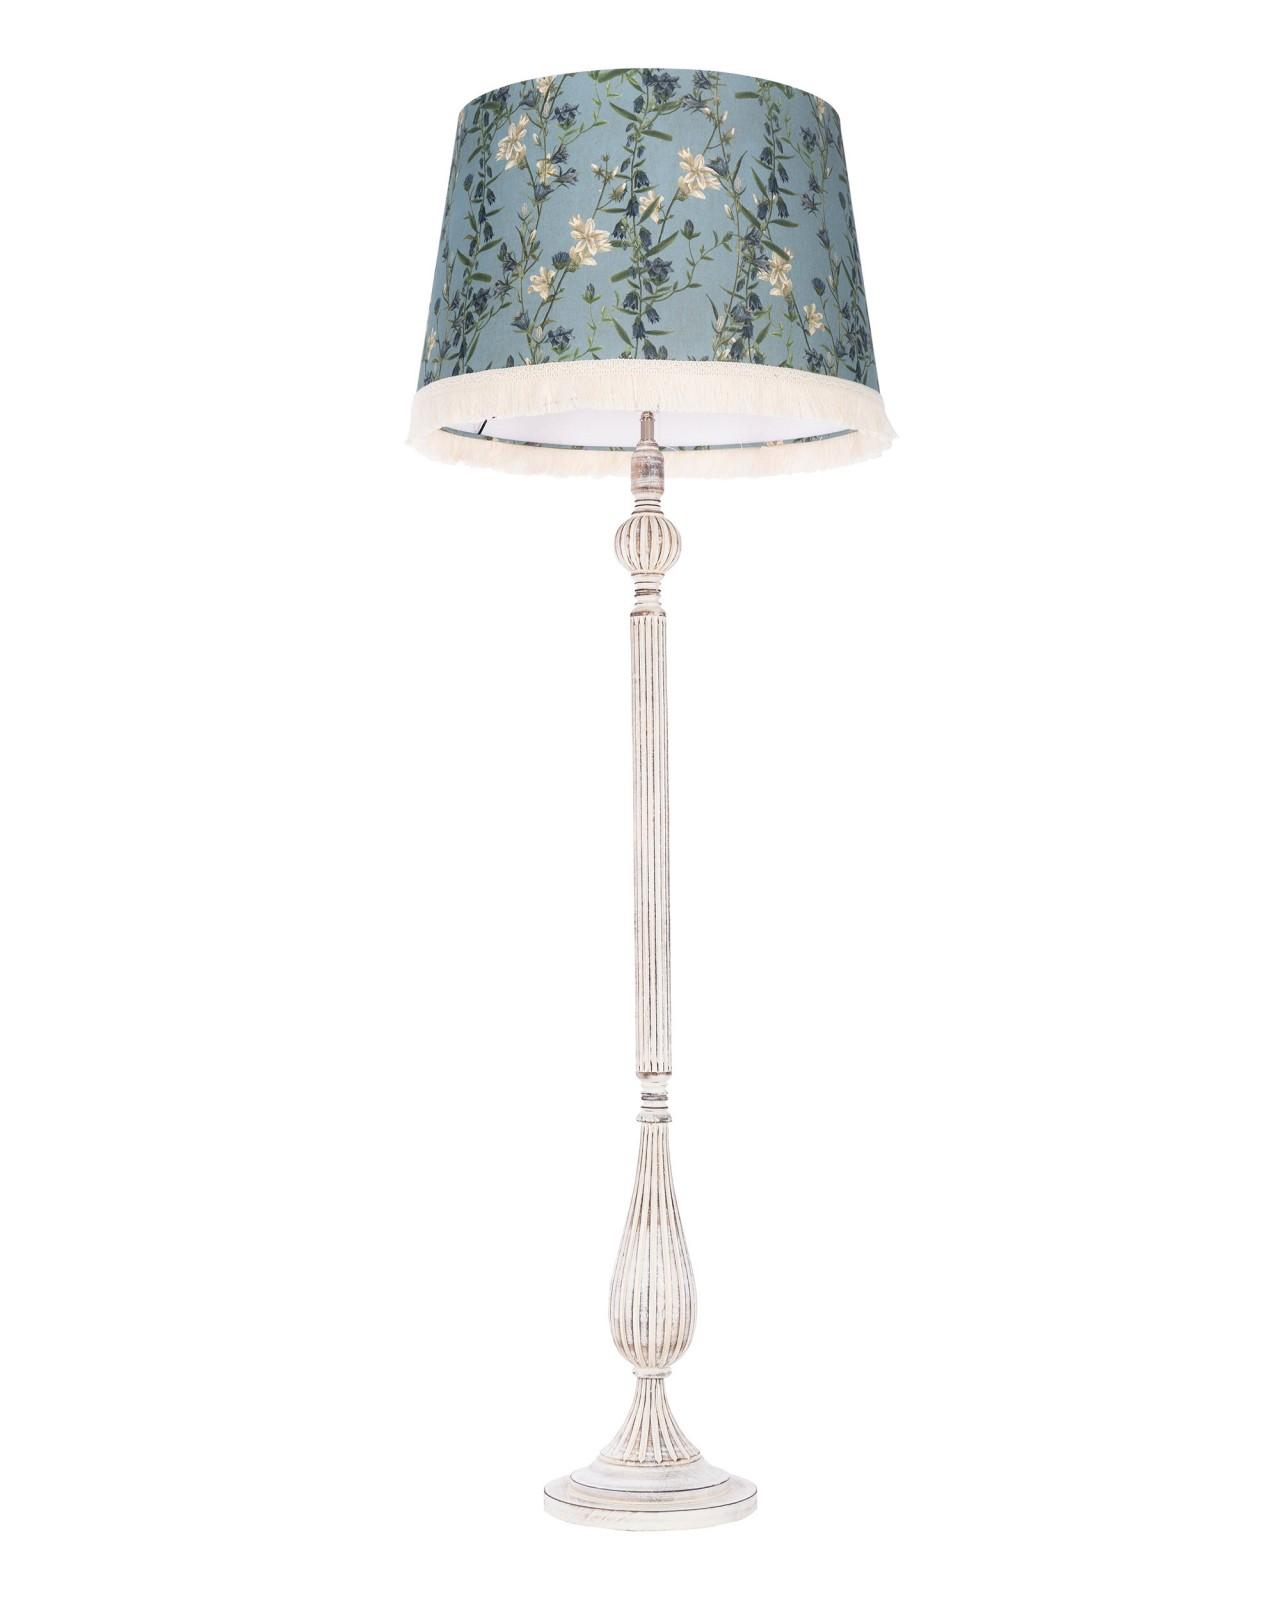 DELICATE BLOOM ARTISAN Floor Lamp